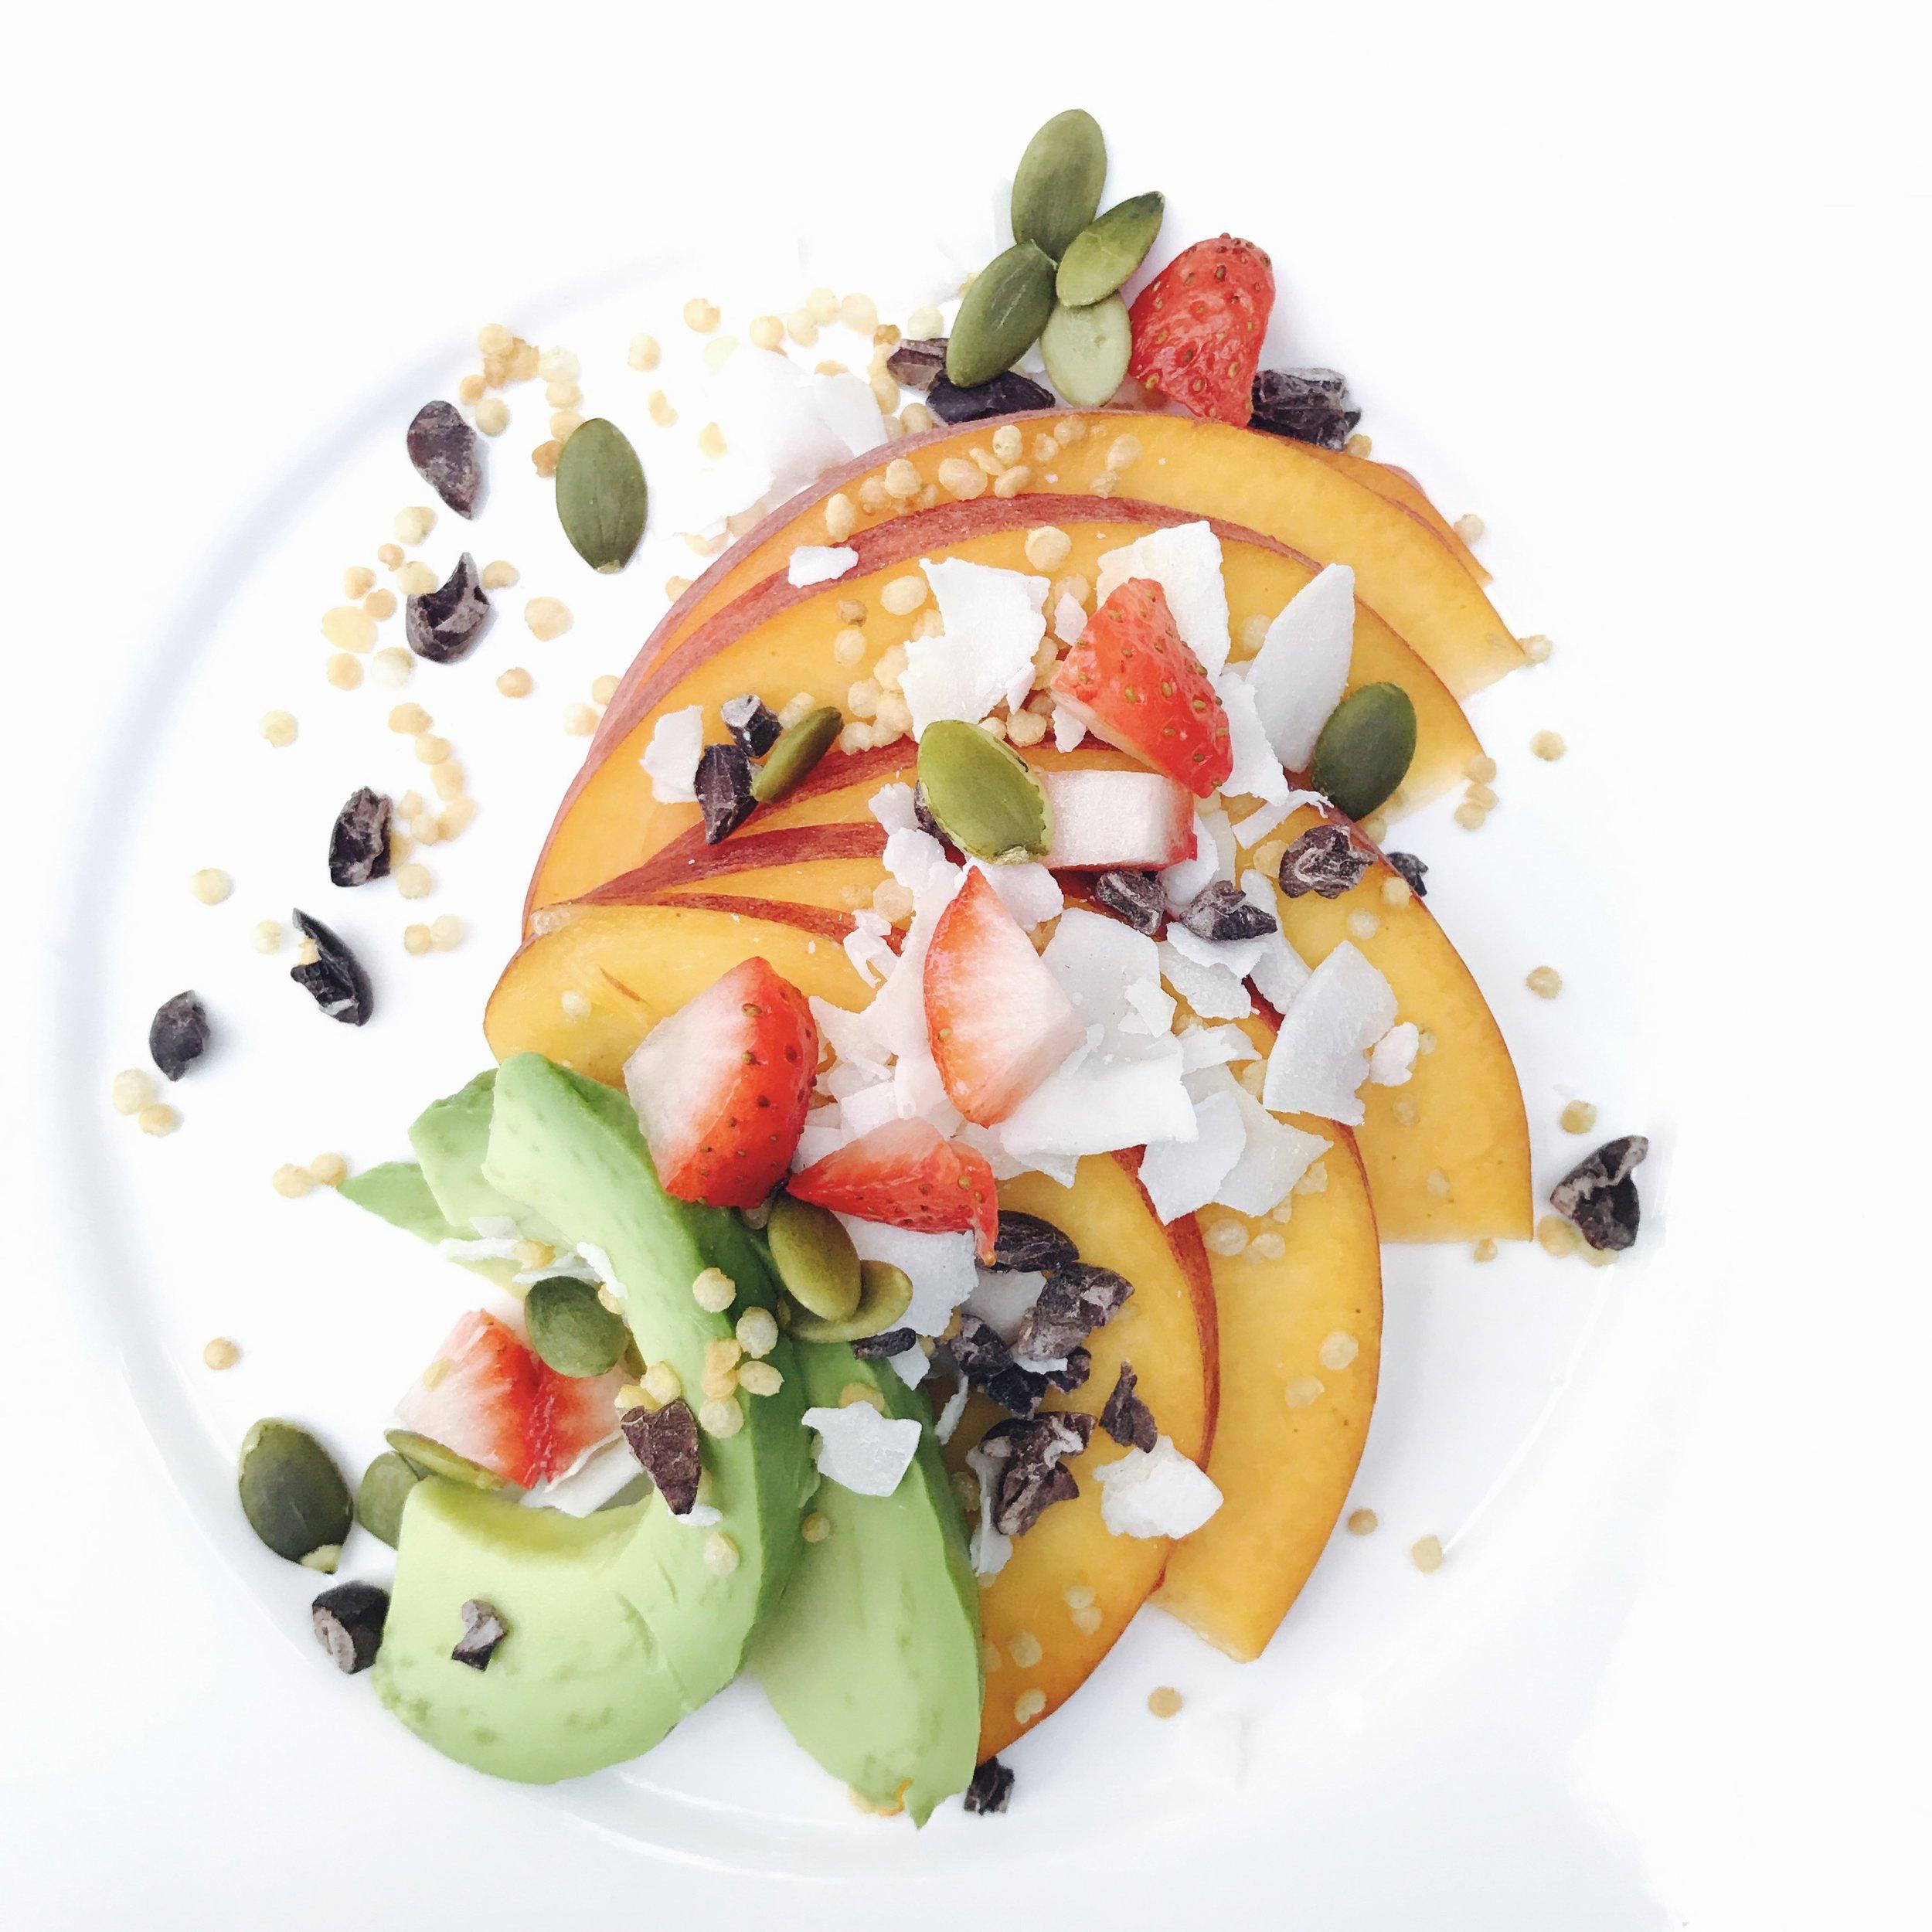 Peaches, Avocado, Strawberries, Pepitas, Cocoa Nibs and Crispy Puffed Quinoa